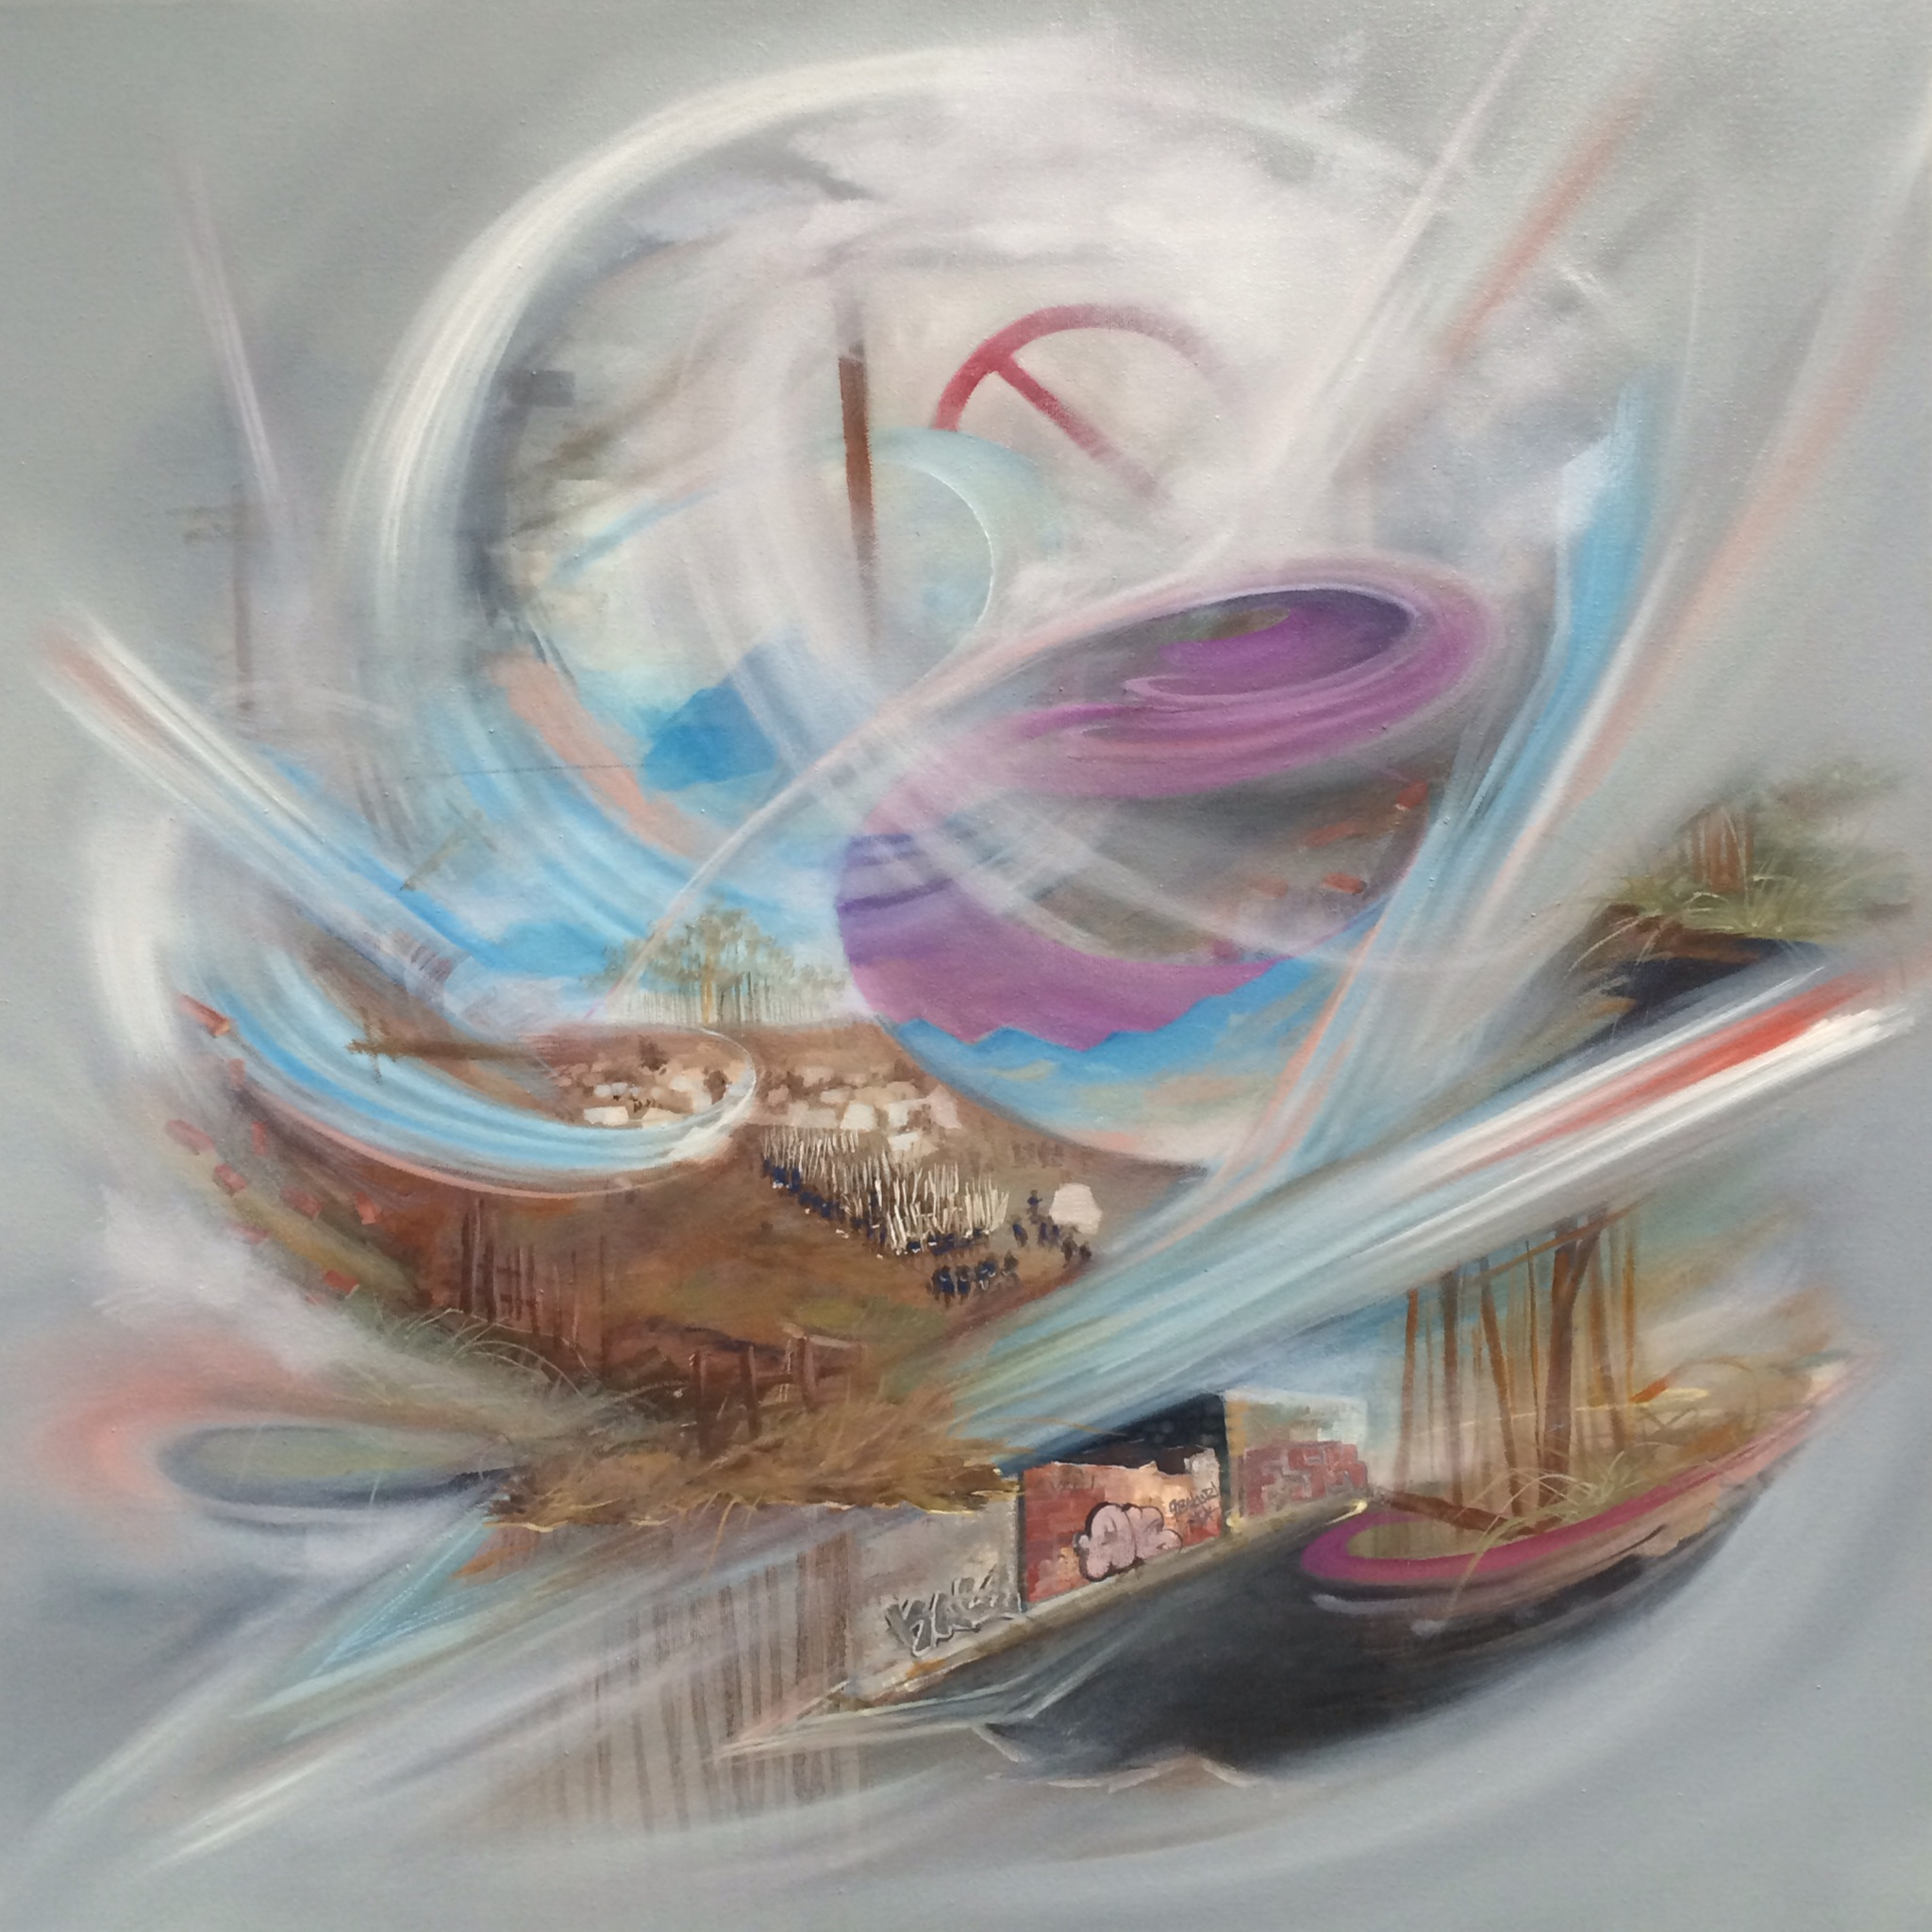  60 cm x 60 cm  Oil on Canvas  2014